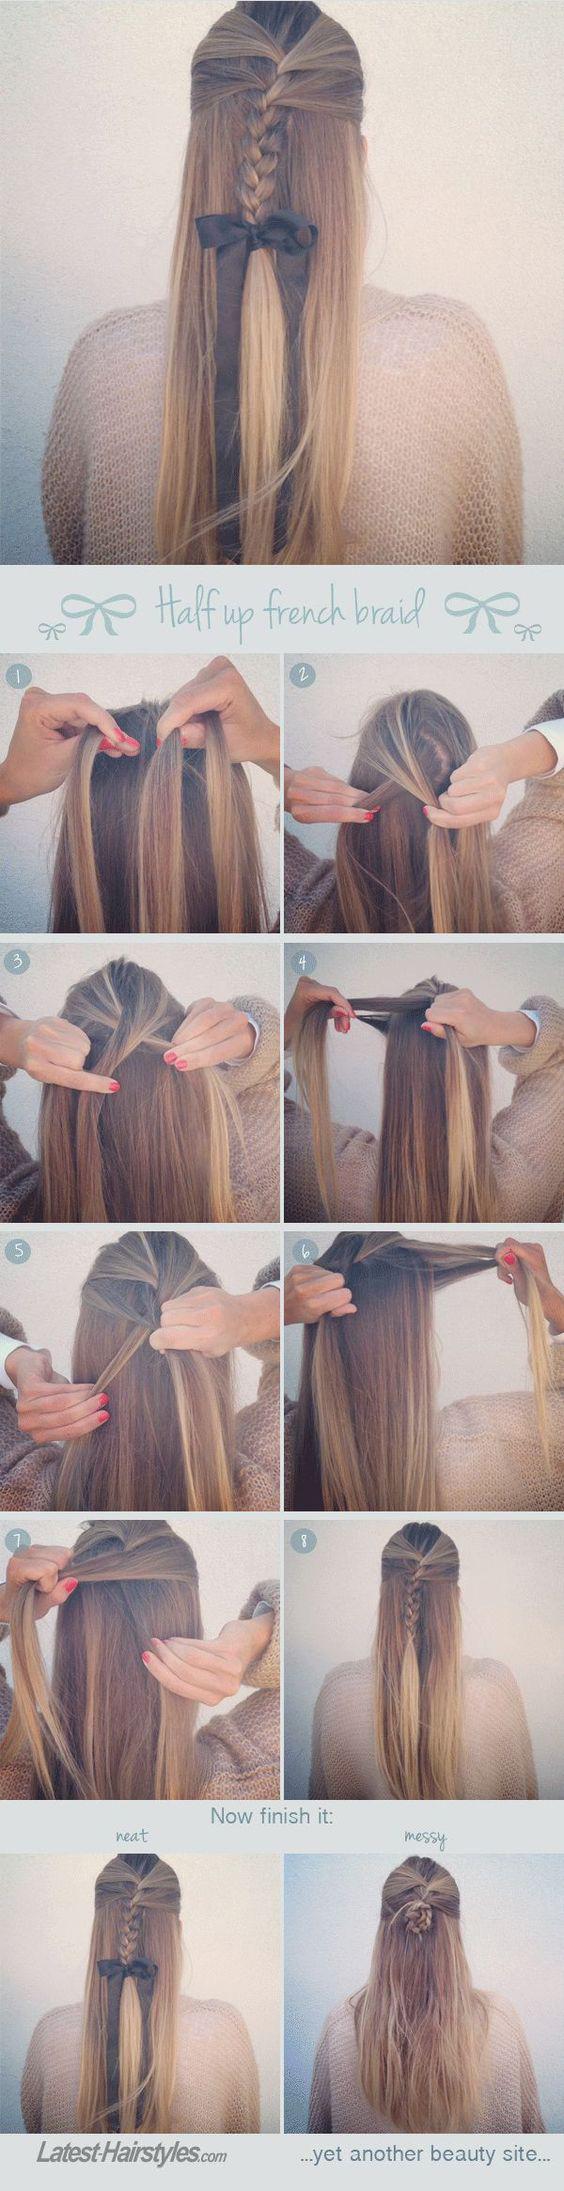 Easy Step by step hair tutorials for long hair